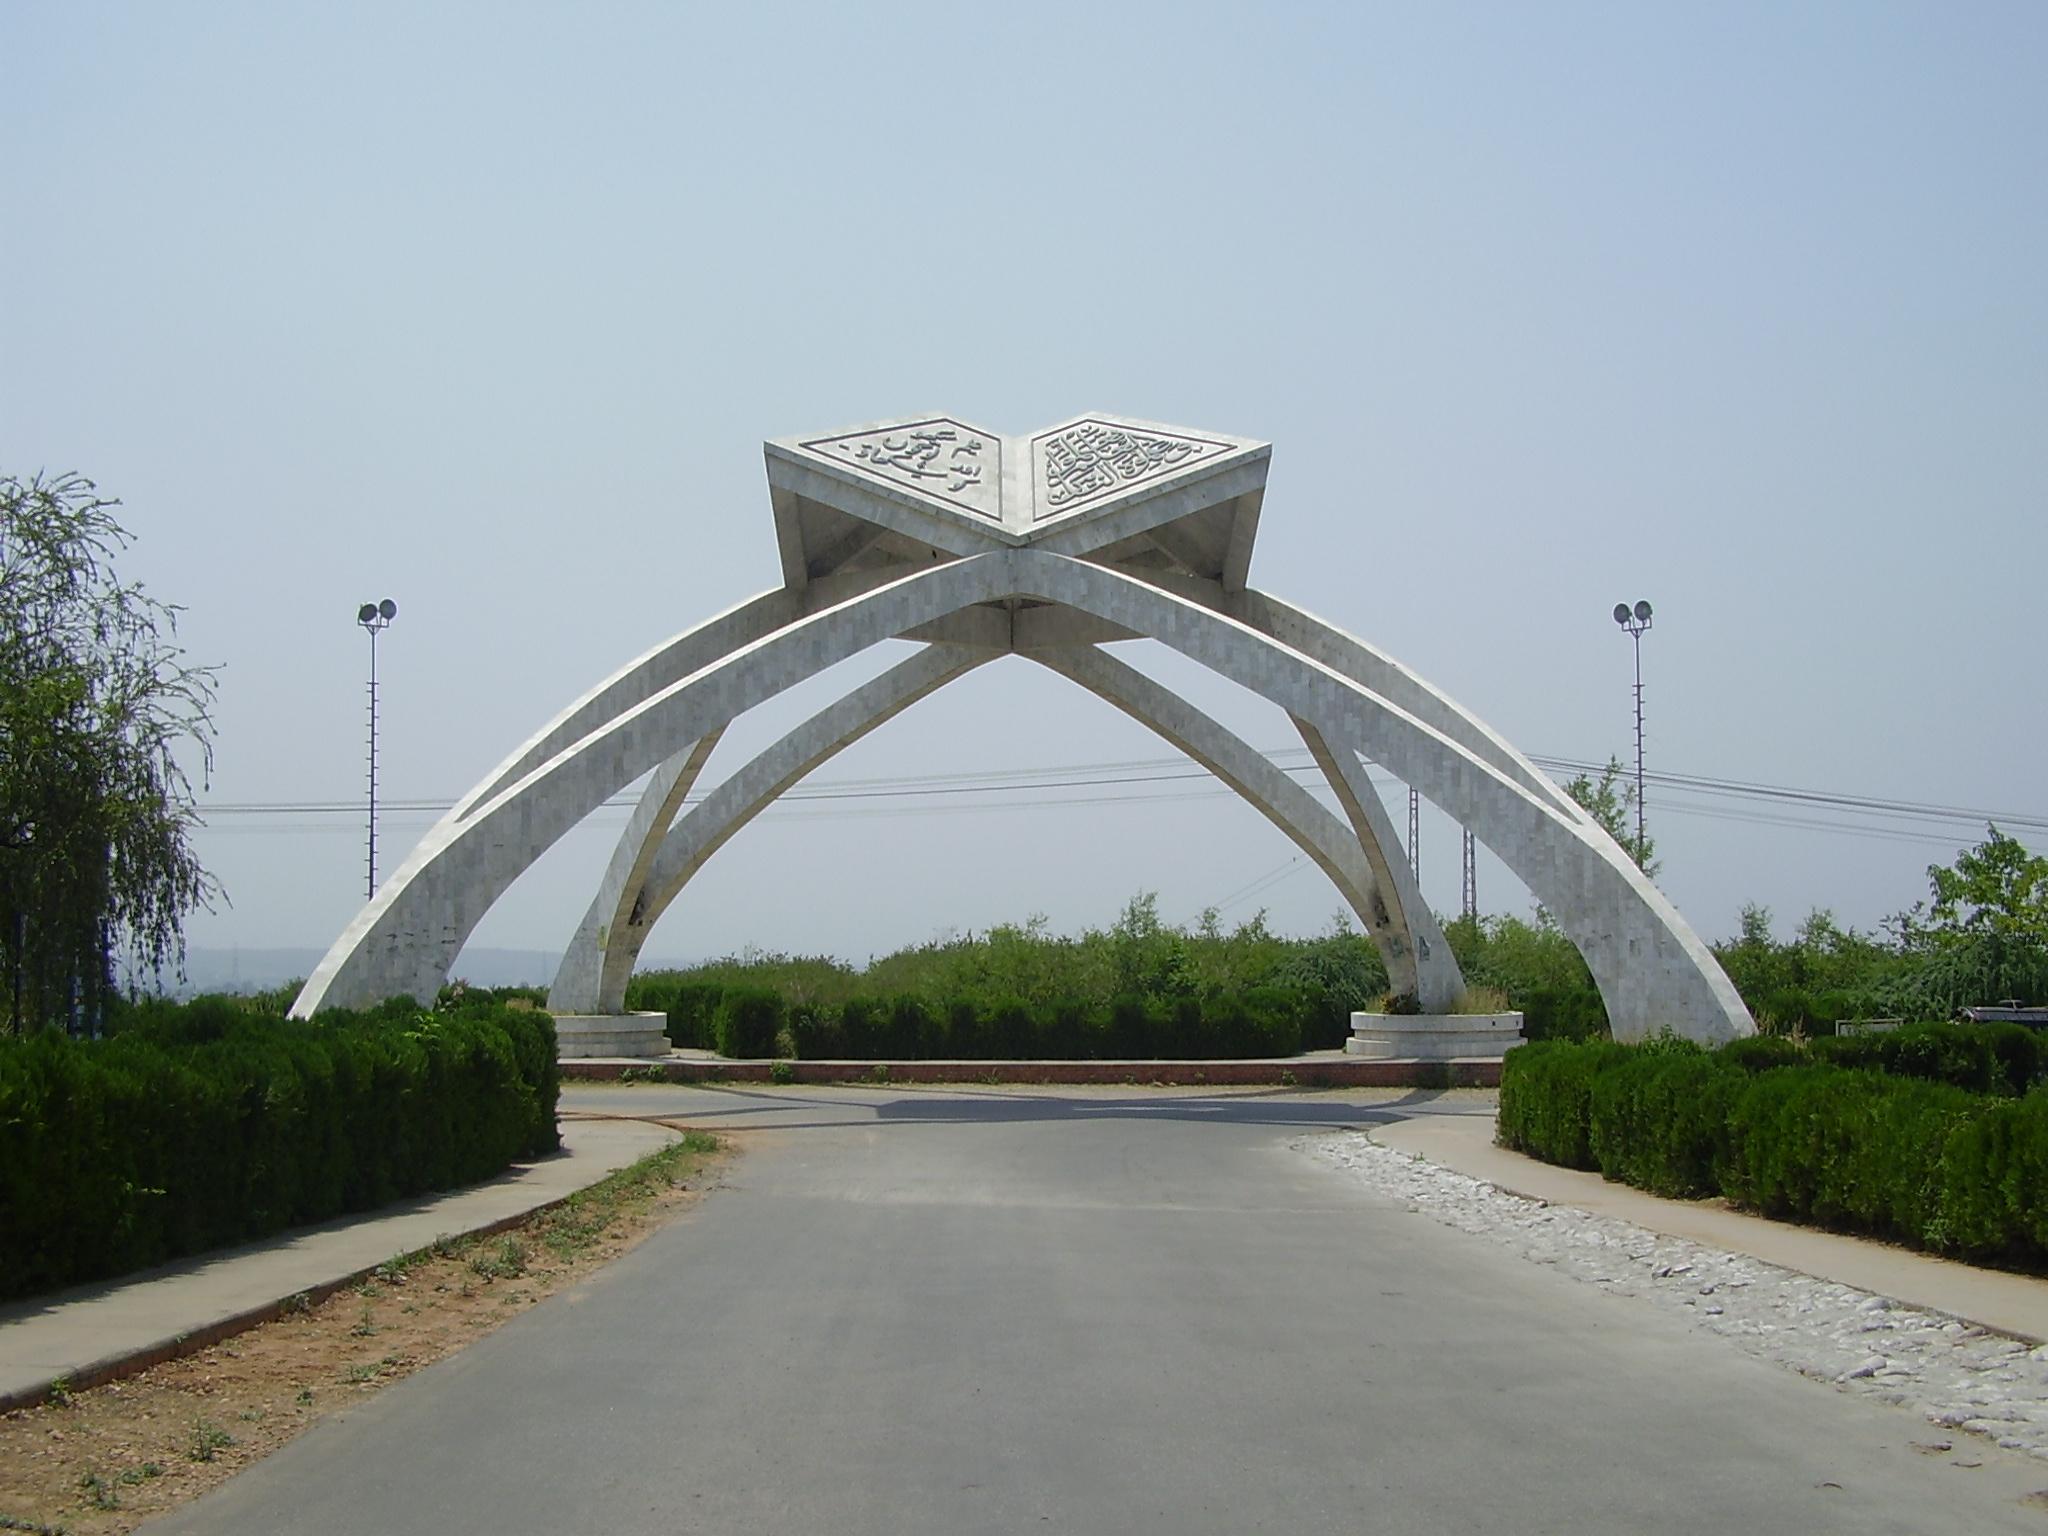 http://www.awwaaz.com/images/stories/قائدِ اعظم یونیورسٹی کی 2سو ایکڑ زمین پر قبضہ، یونیورسٹی کی نیب کو دہائی